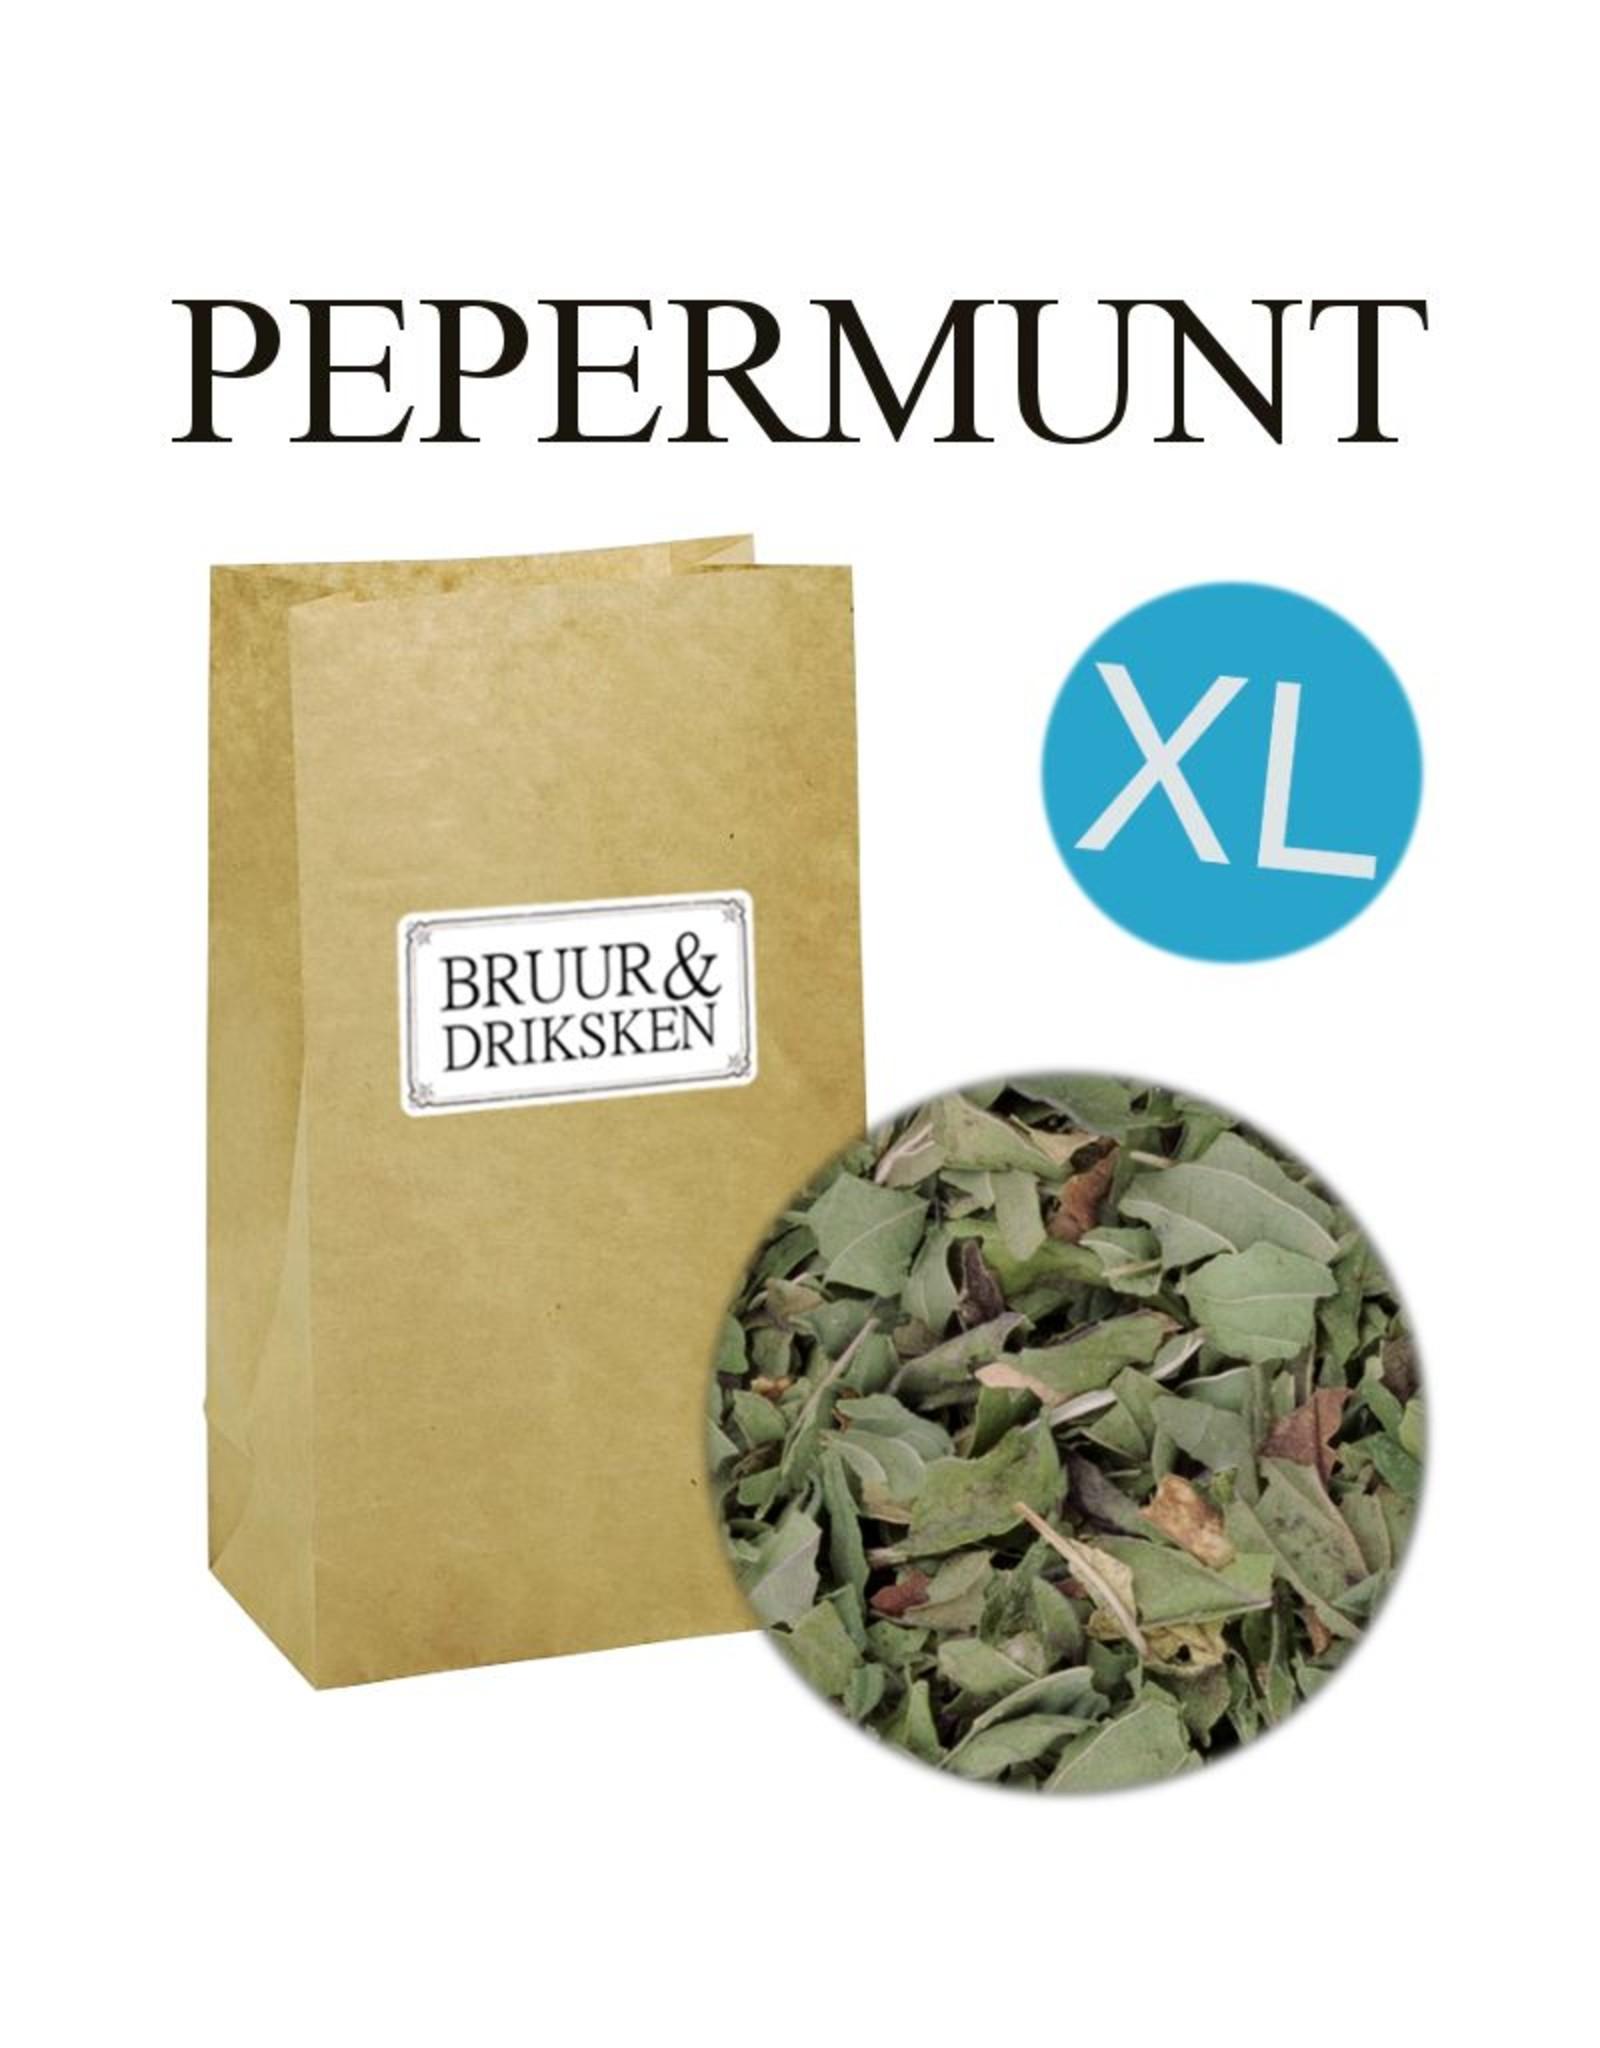 Pepermunt XL 180gr